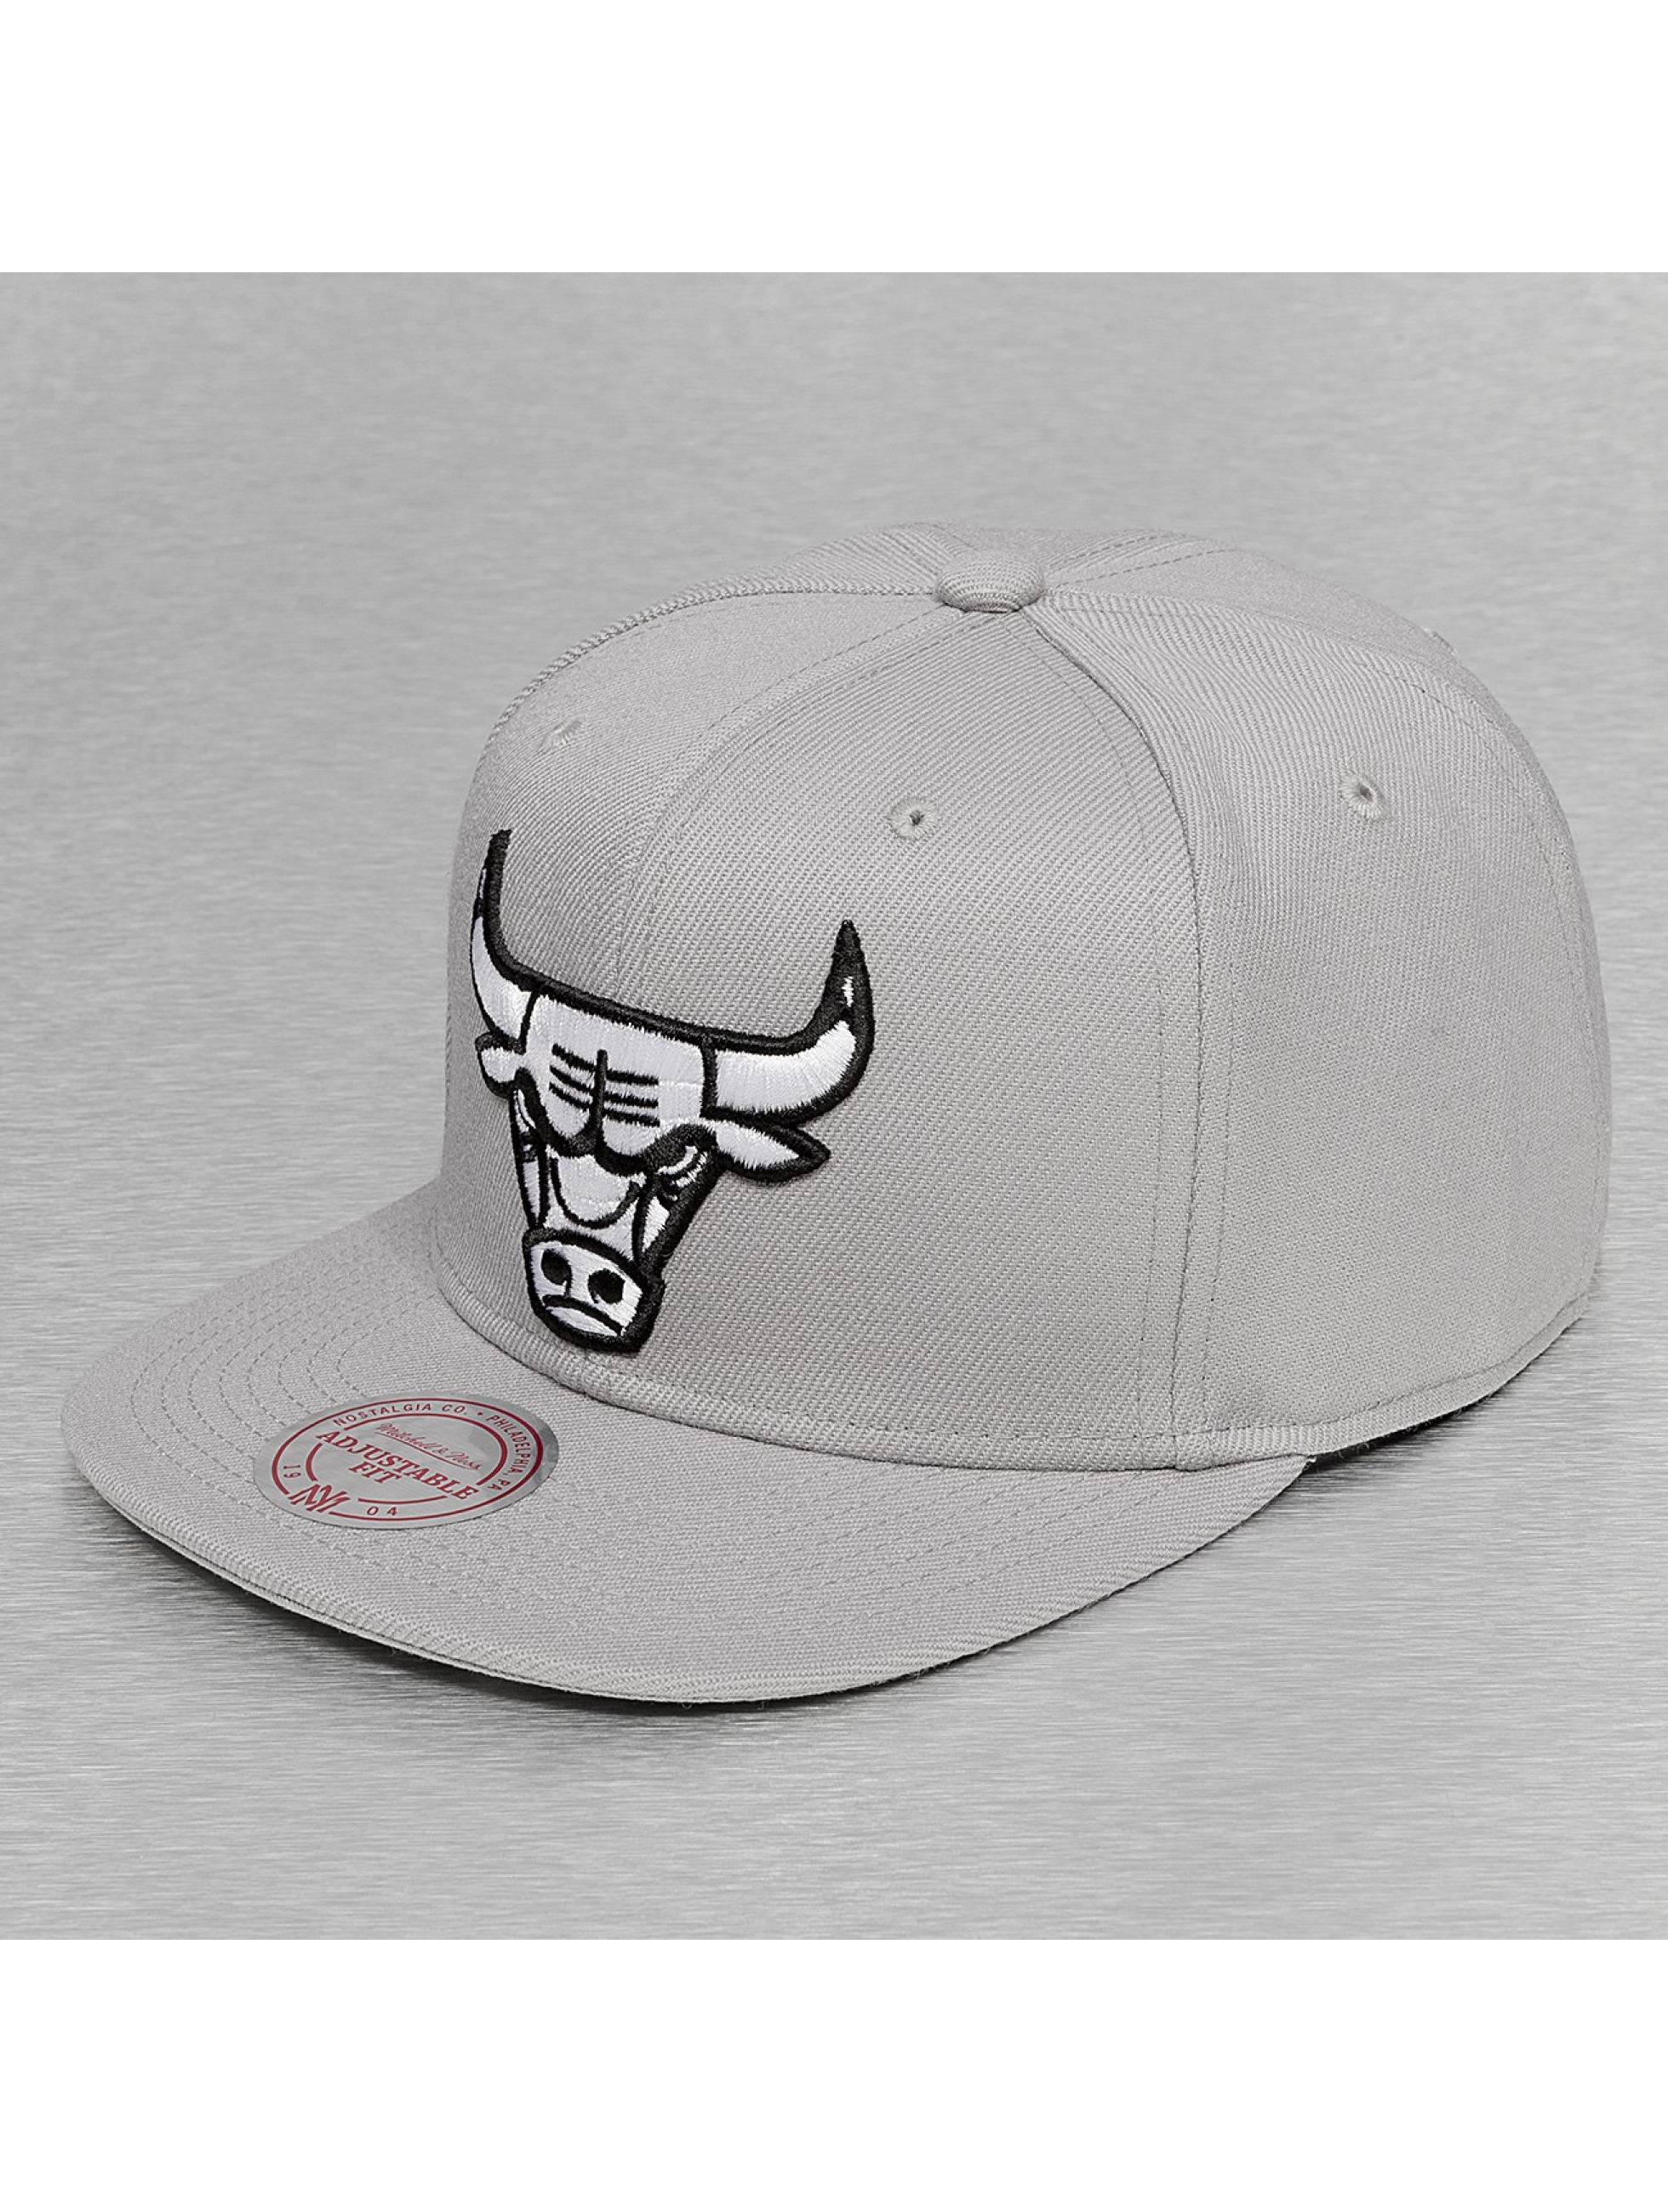 Mitchell & Ness Snapback Cap Black & White Logo Series grau